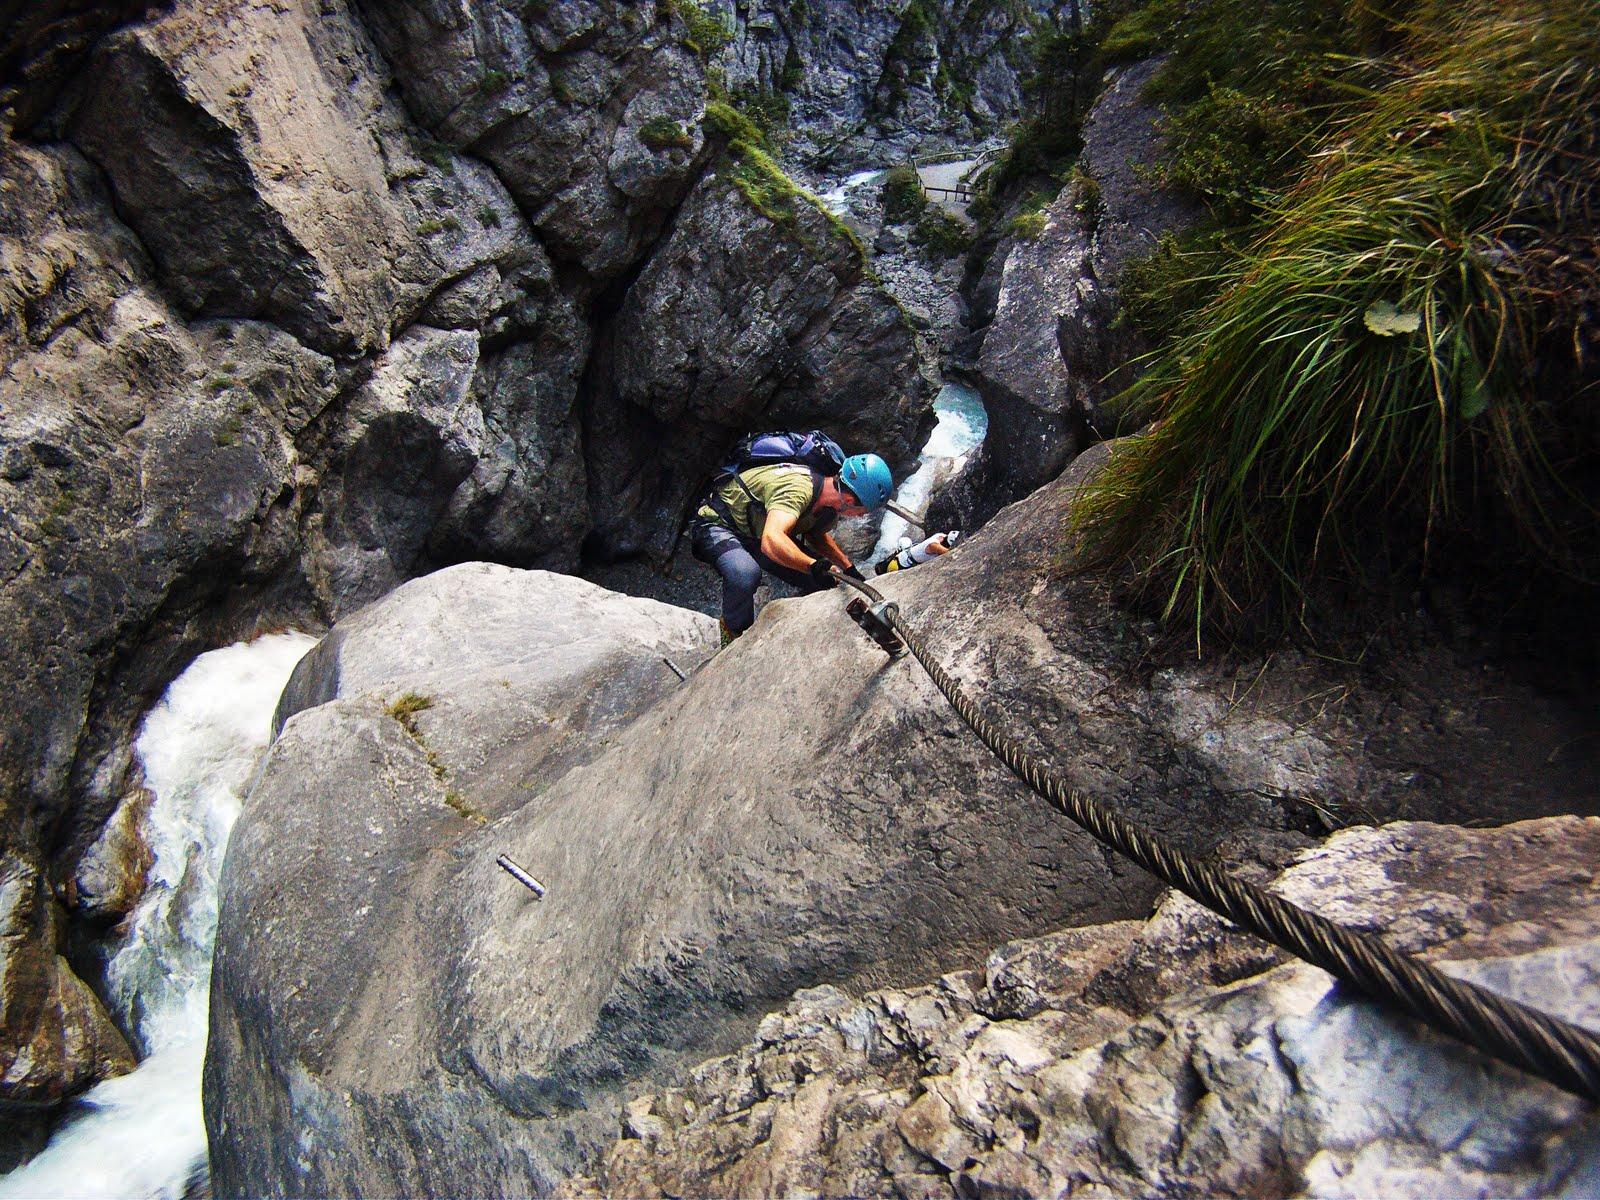 Klettersteig Set Leihen Berchtesgaden : Klettersteig galitzenklamm peter gratl